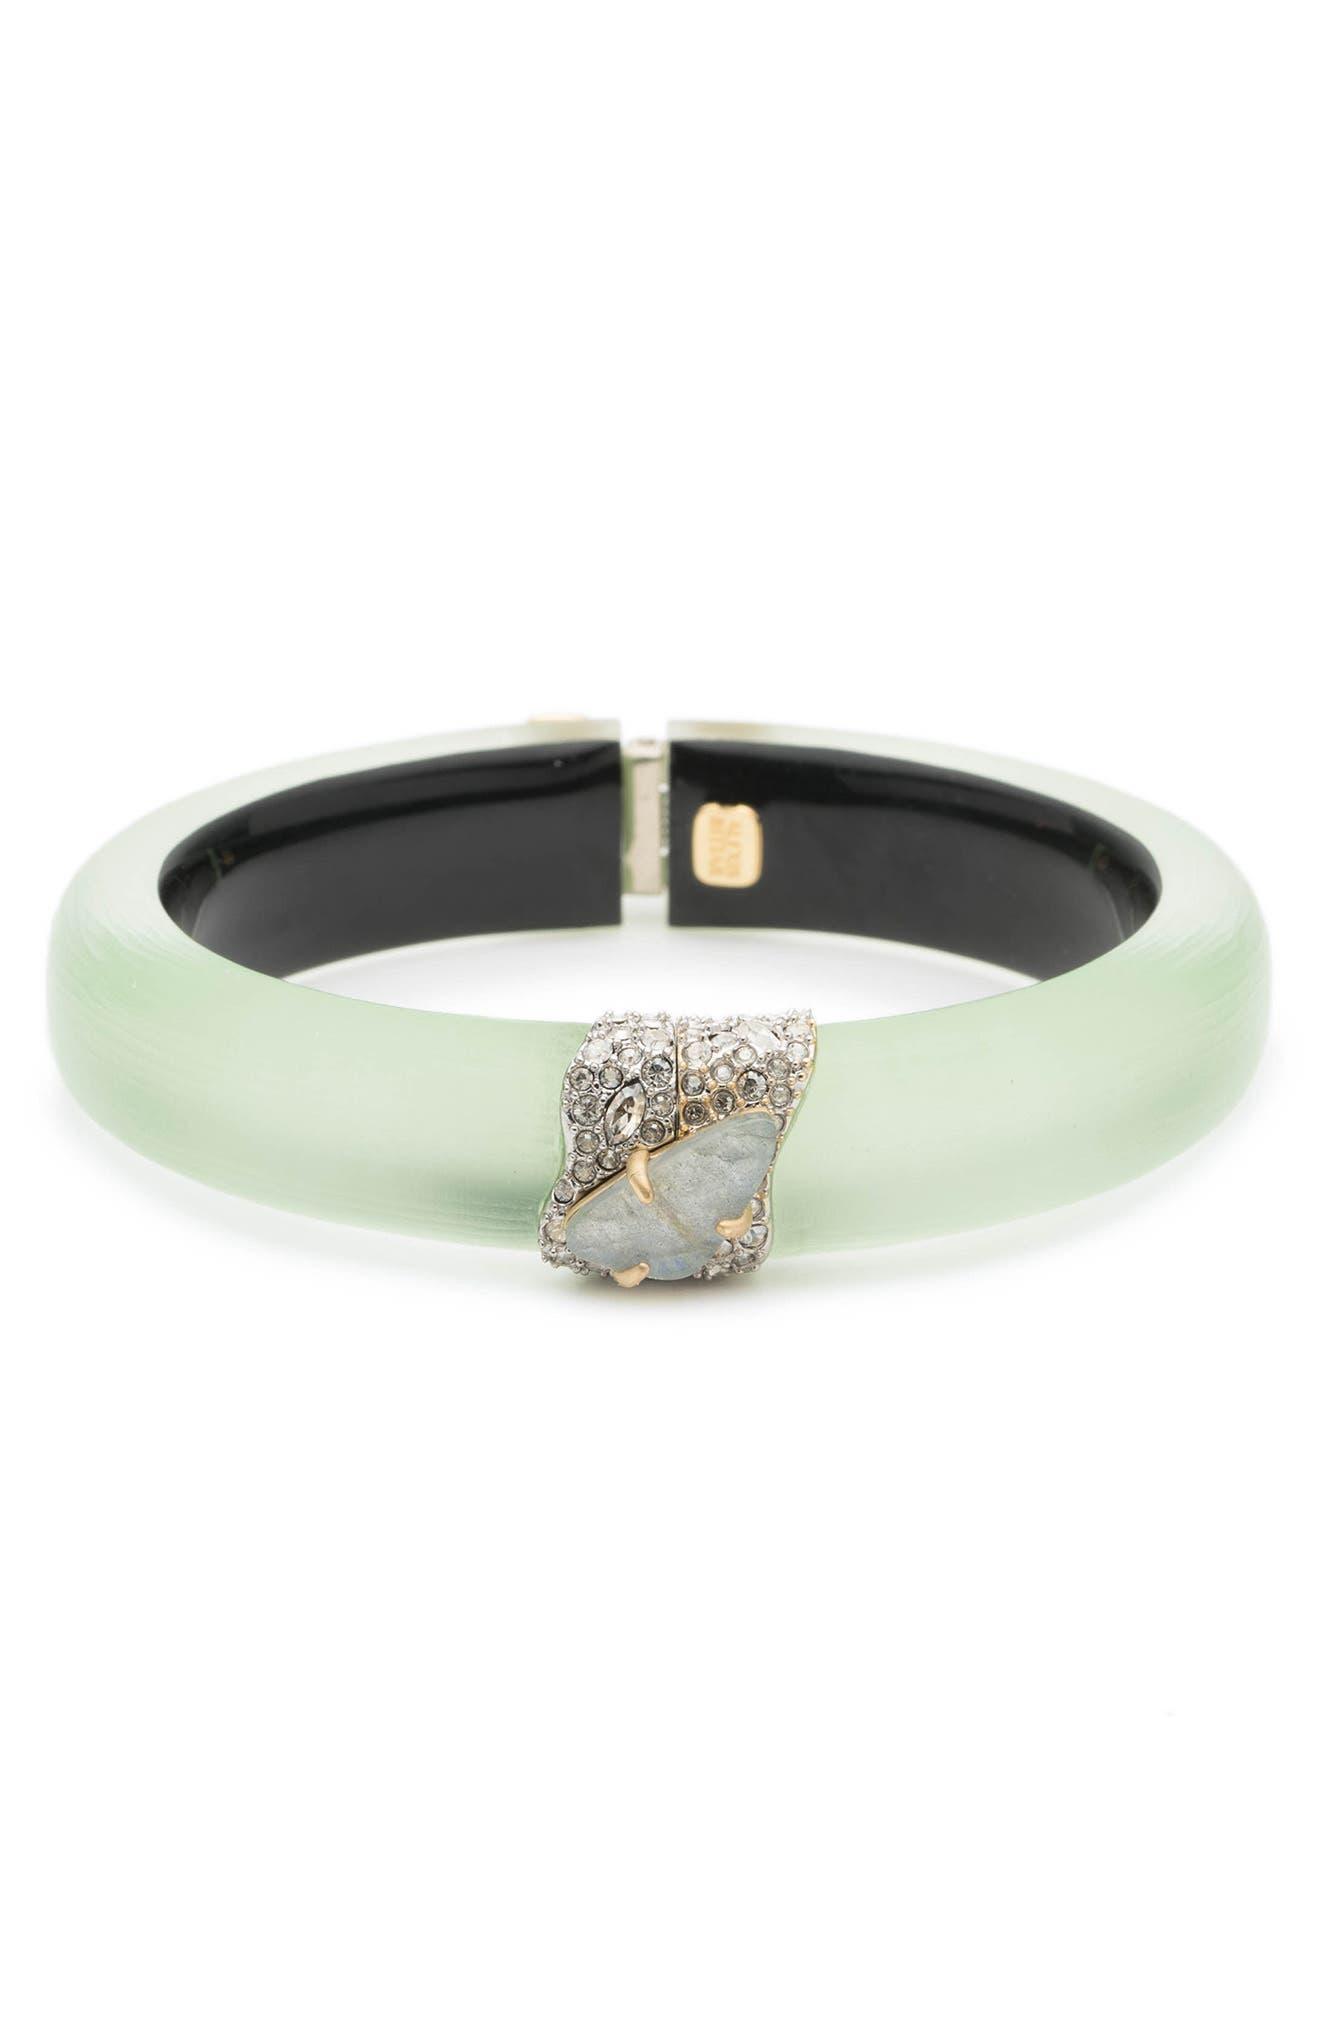 Crystal Encrusted Roxbury Bracelet,                             Main thumbnail 1, color,                             Seafoam